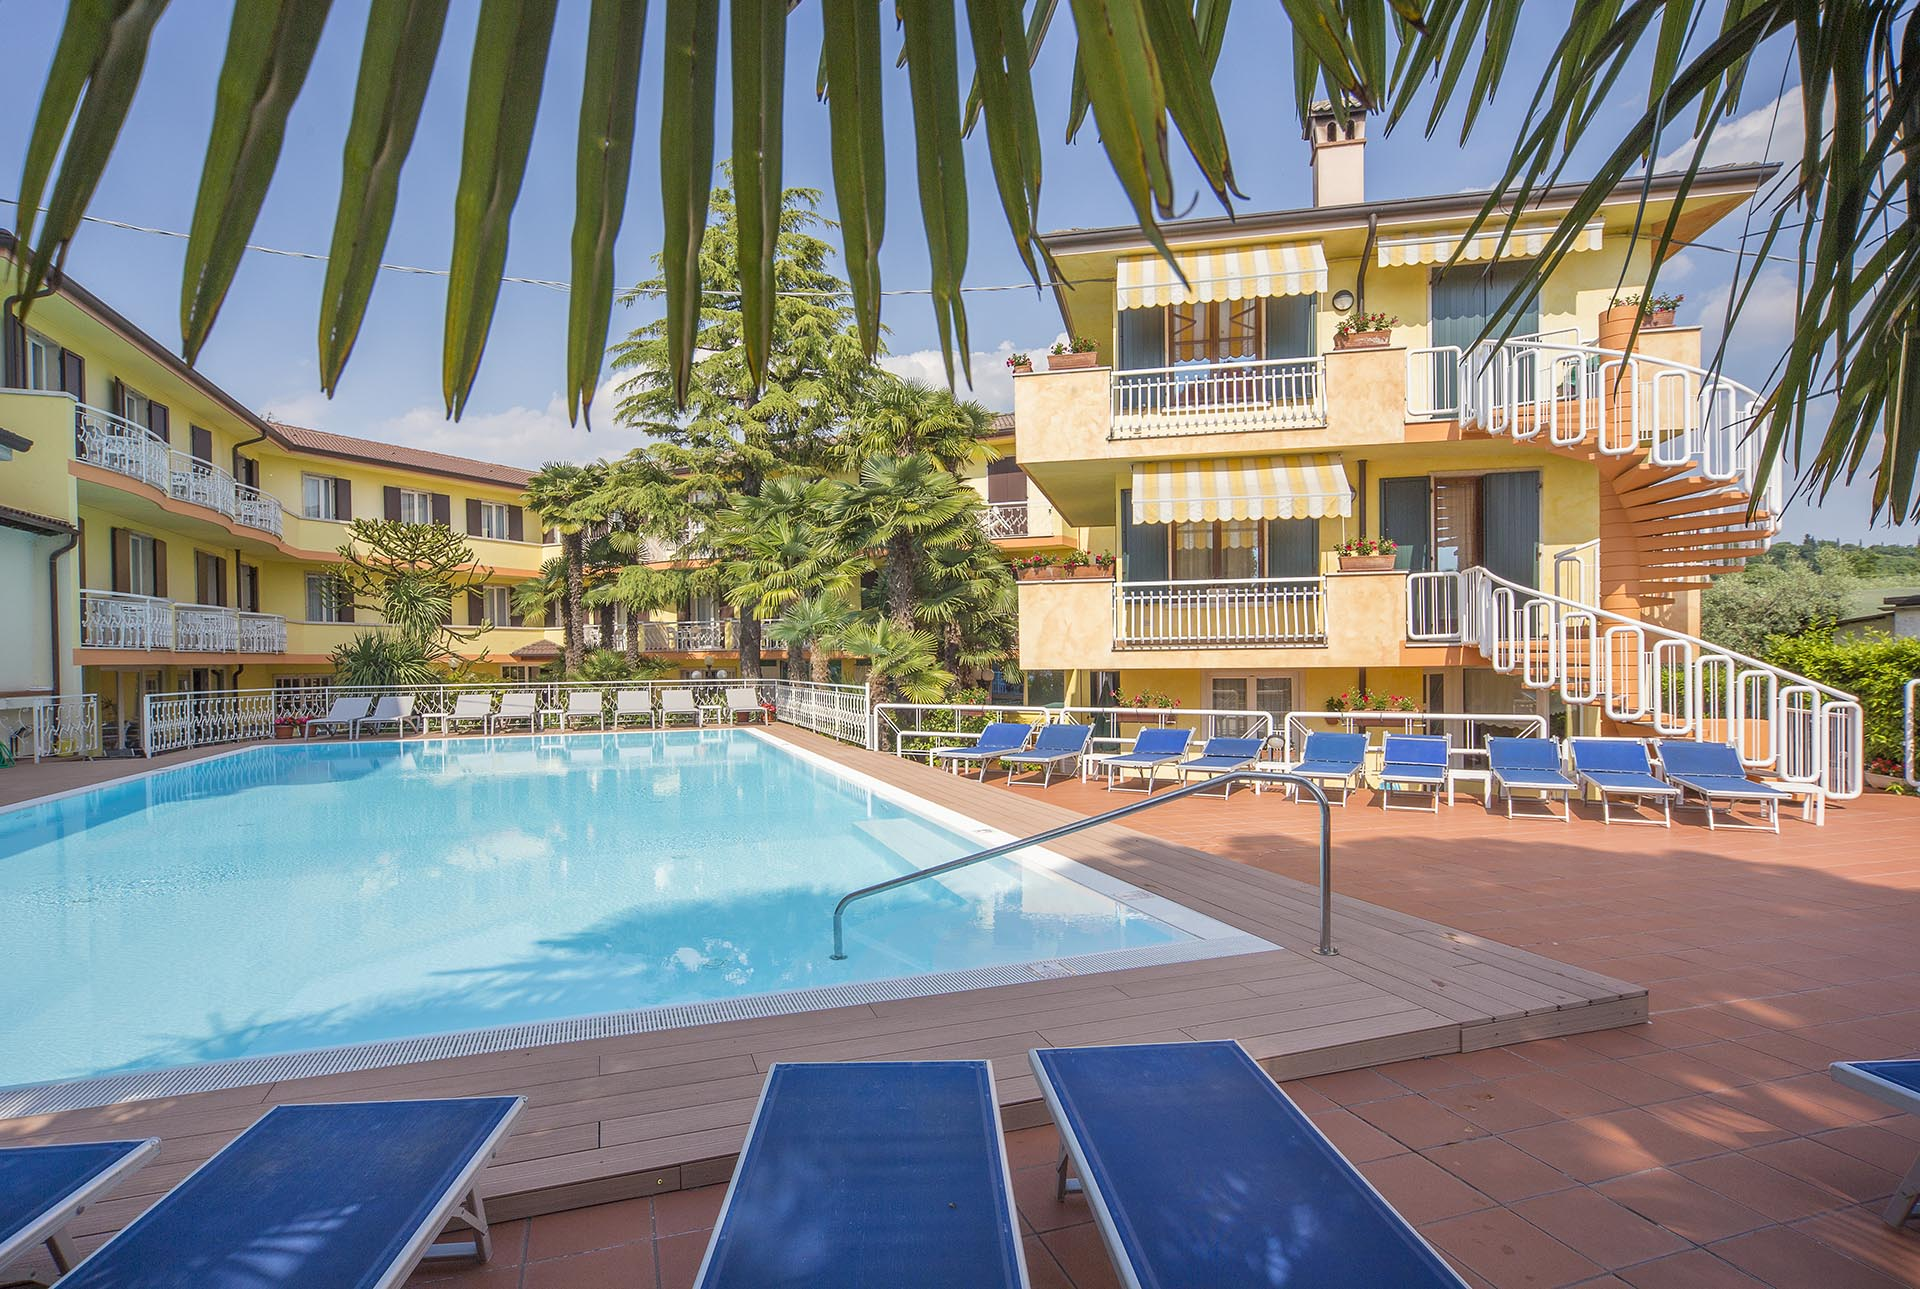 Offerte Verona Hotel